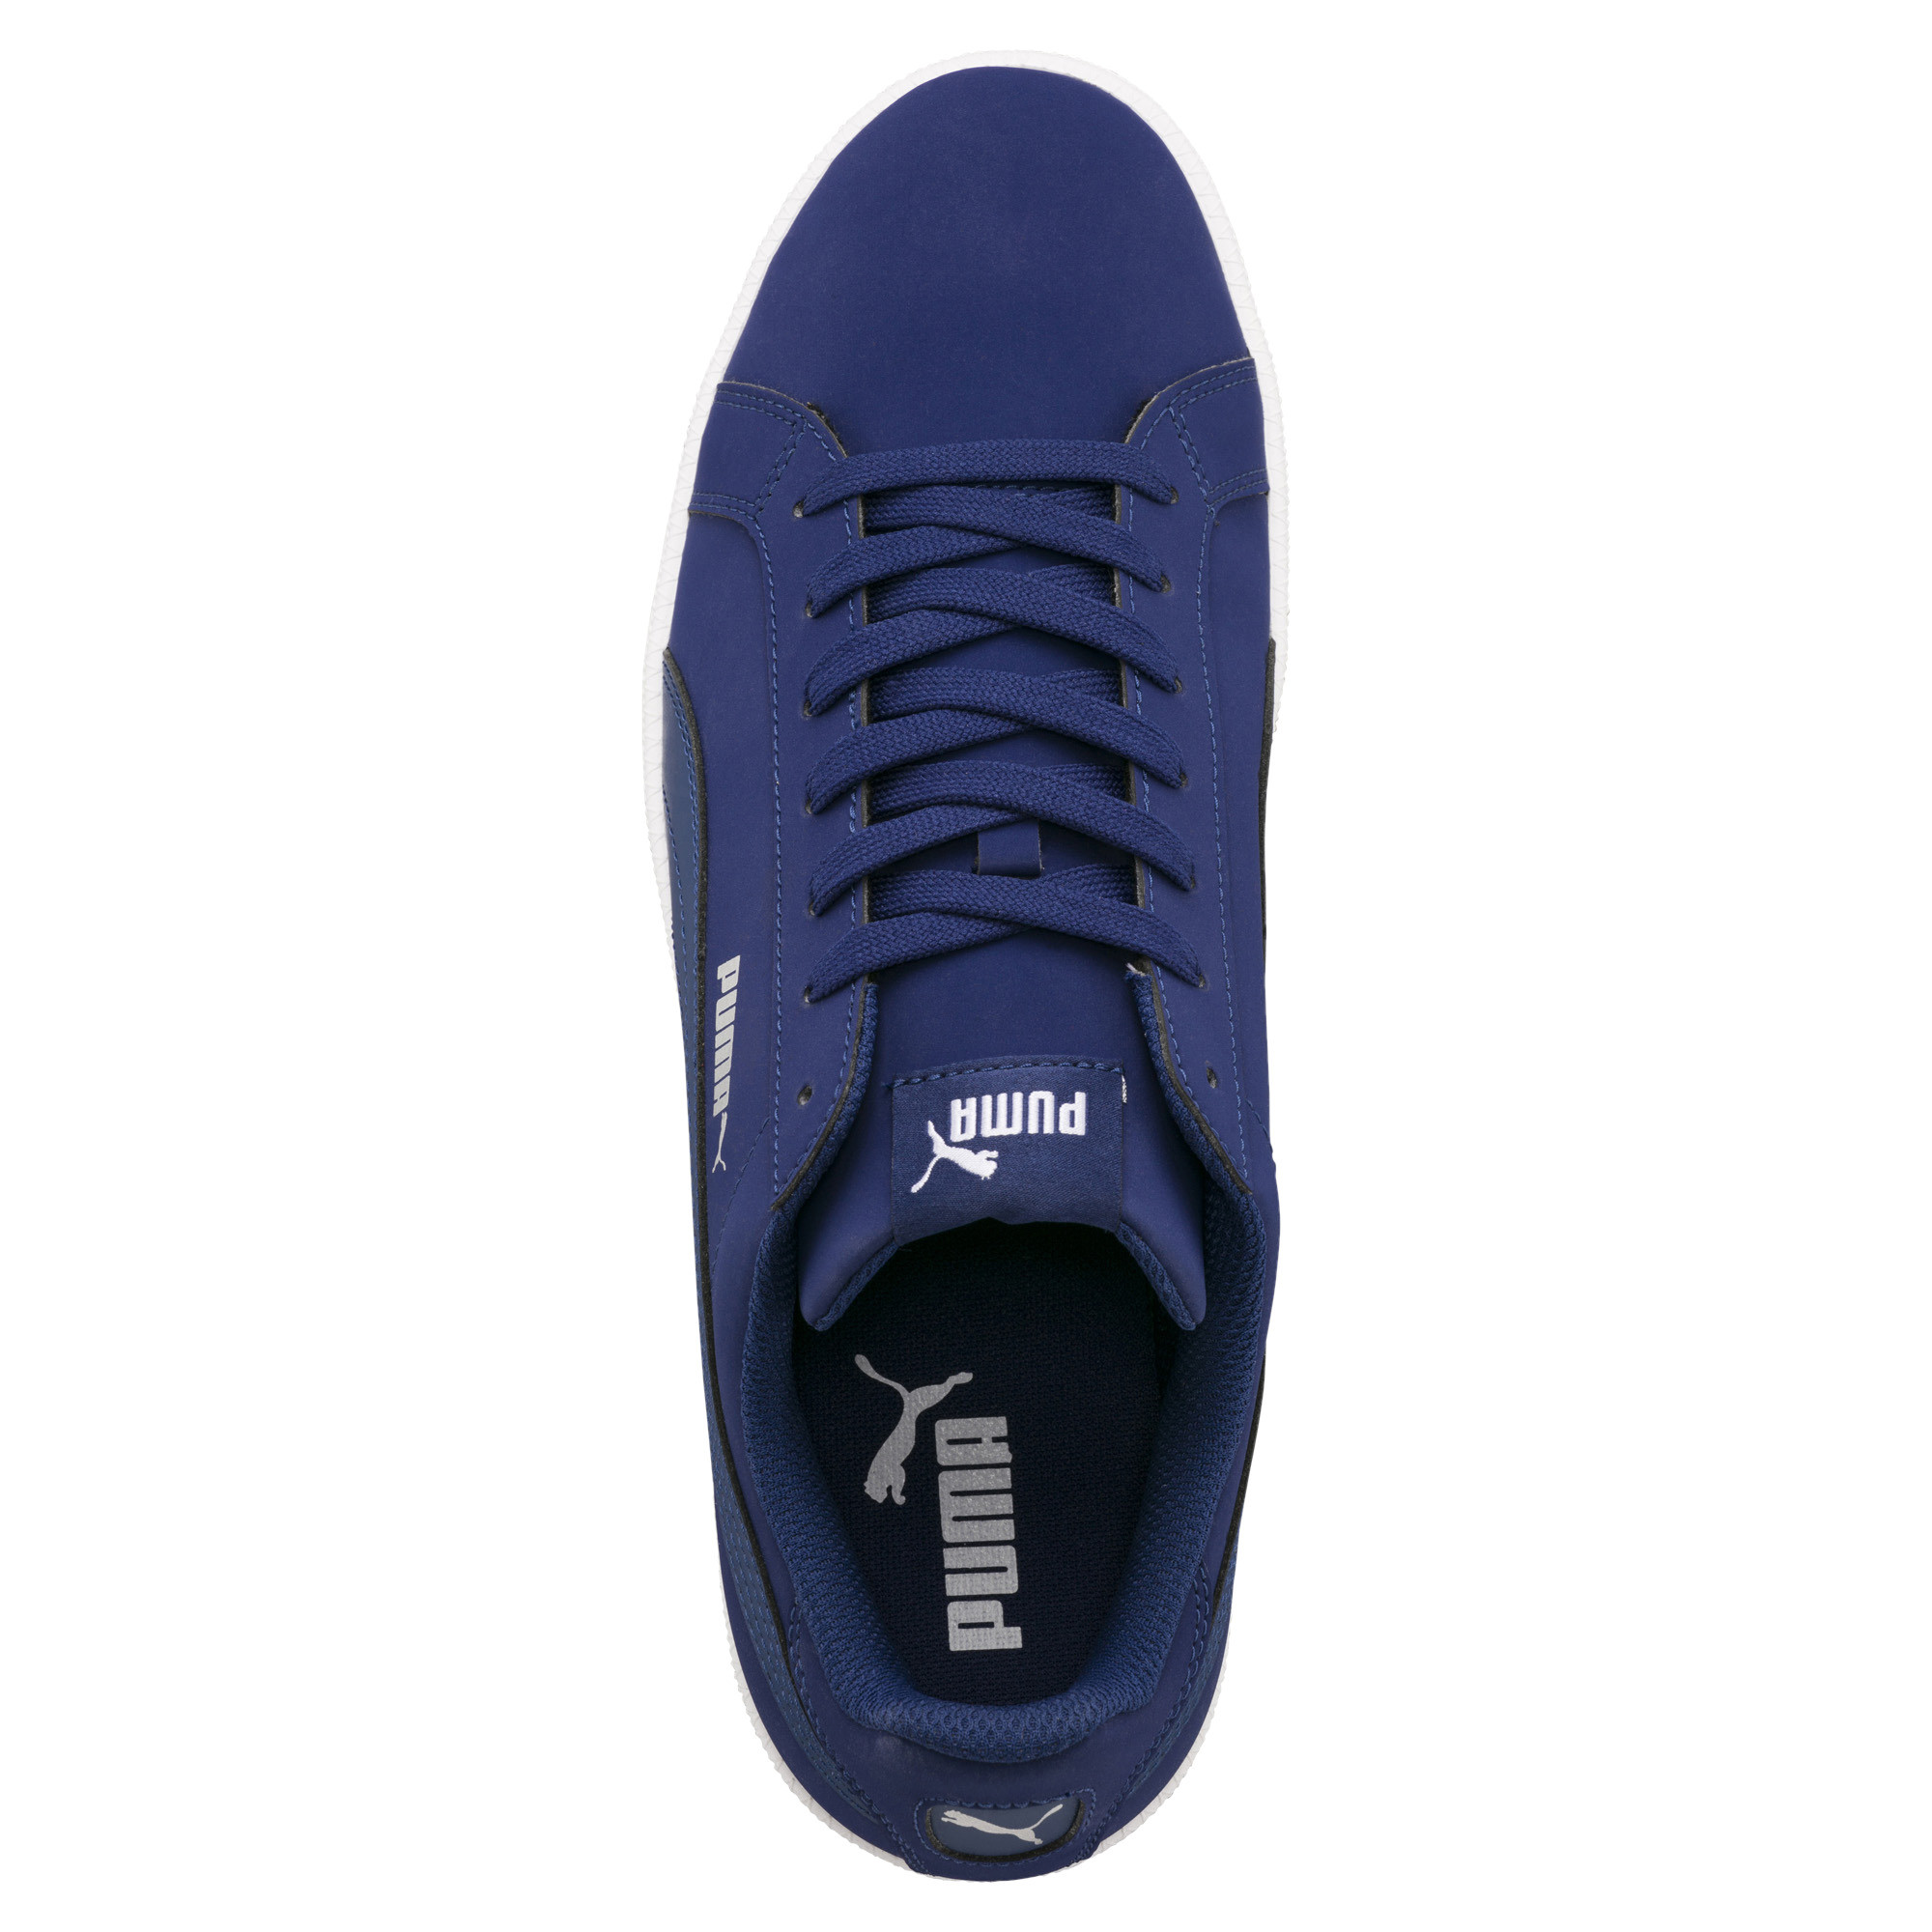 Indexbild 6 - PUMA Smash Buck Sneaker Unisex Schuhe Sport Classics Neu